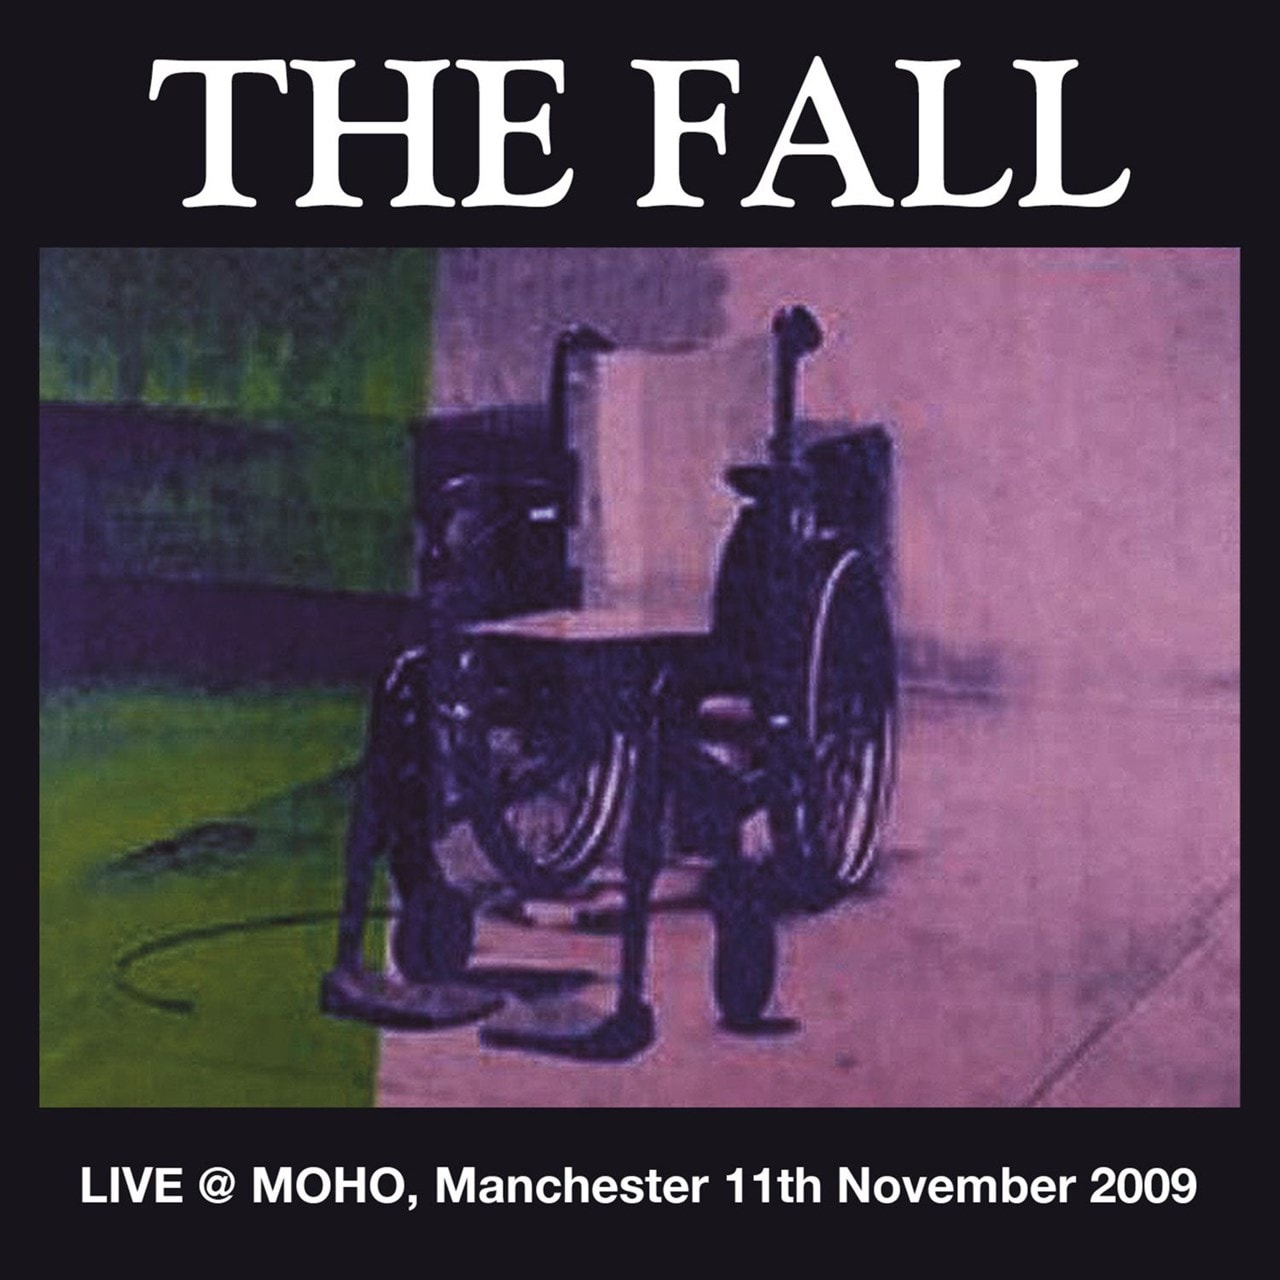 Live @ MOHO, Manchester 11th November 2009 - 1